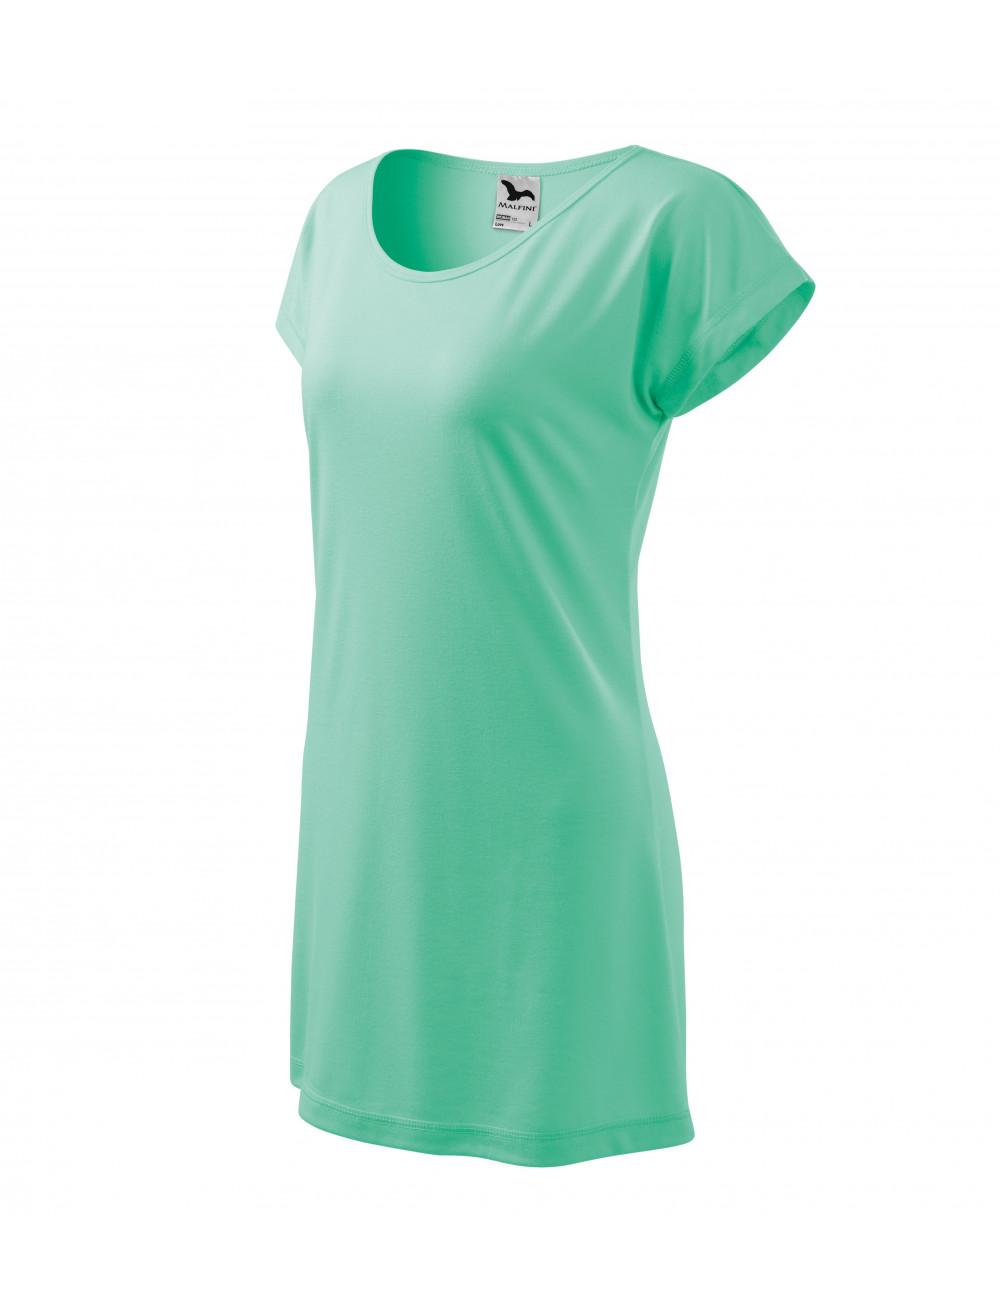 Adler MALFINI Koszulka/sukienka damska Love 123 miętowy